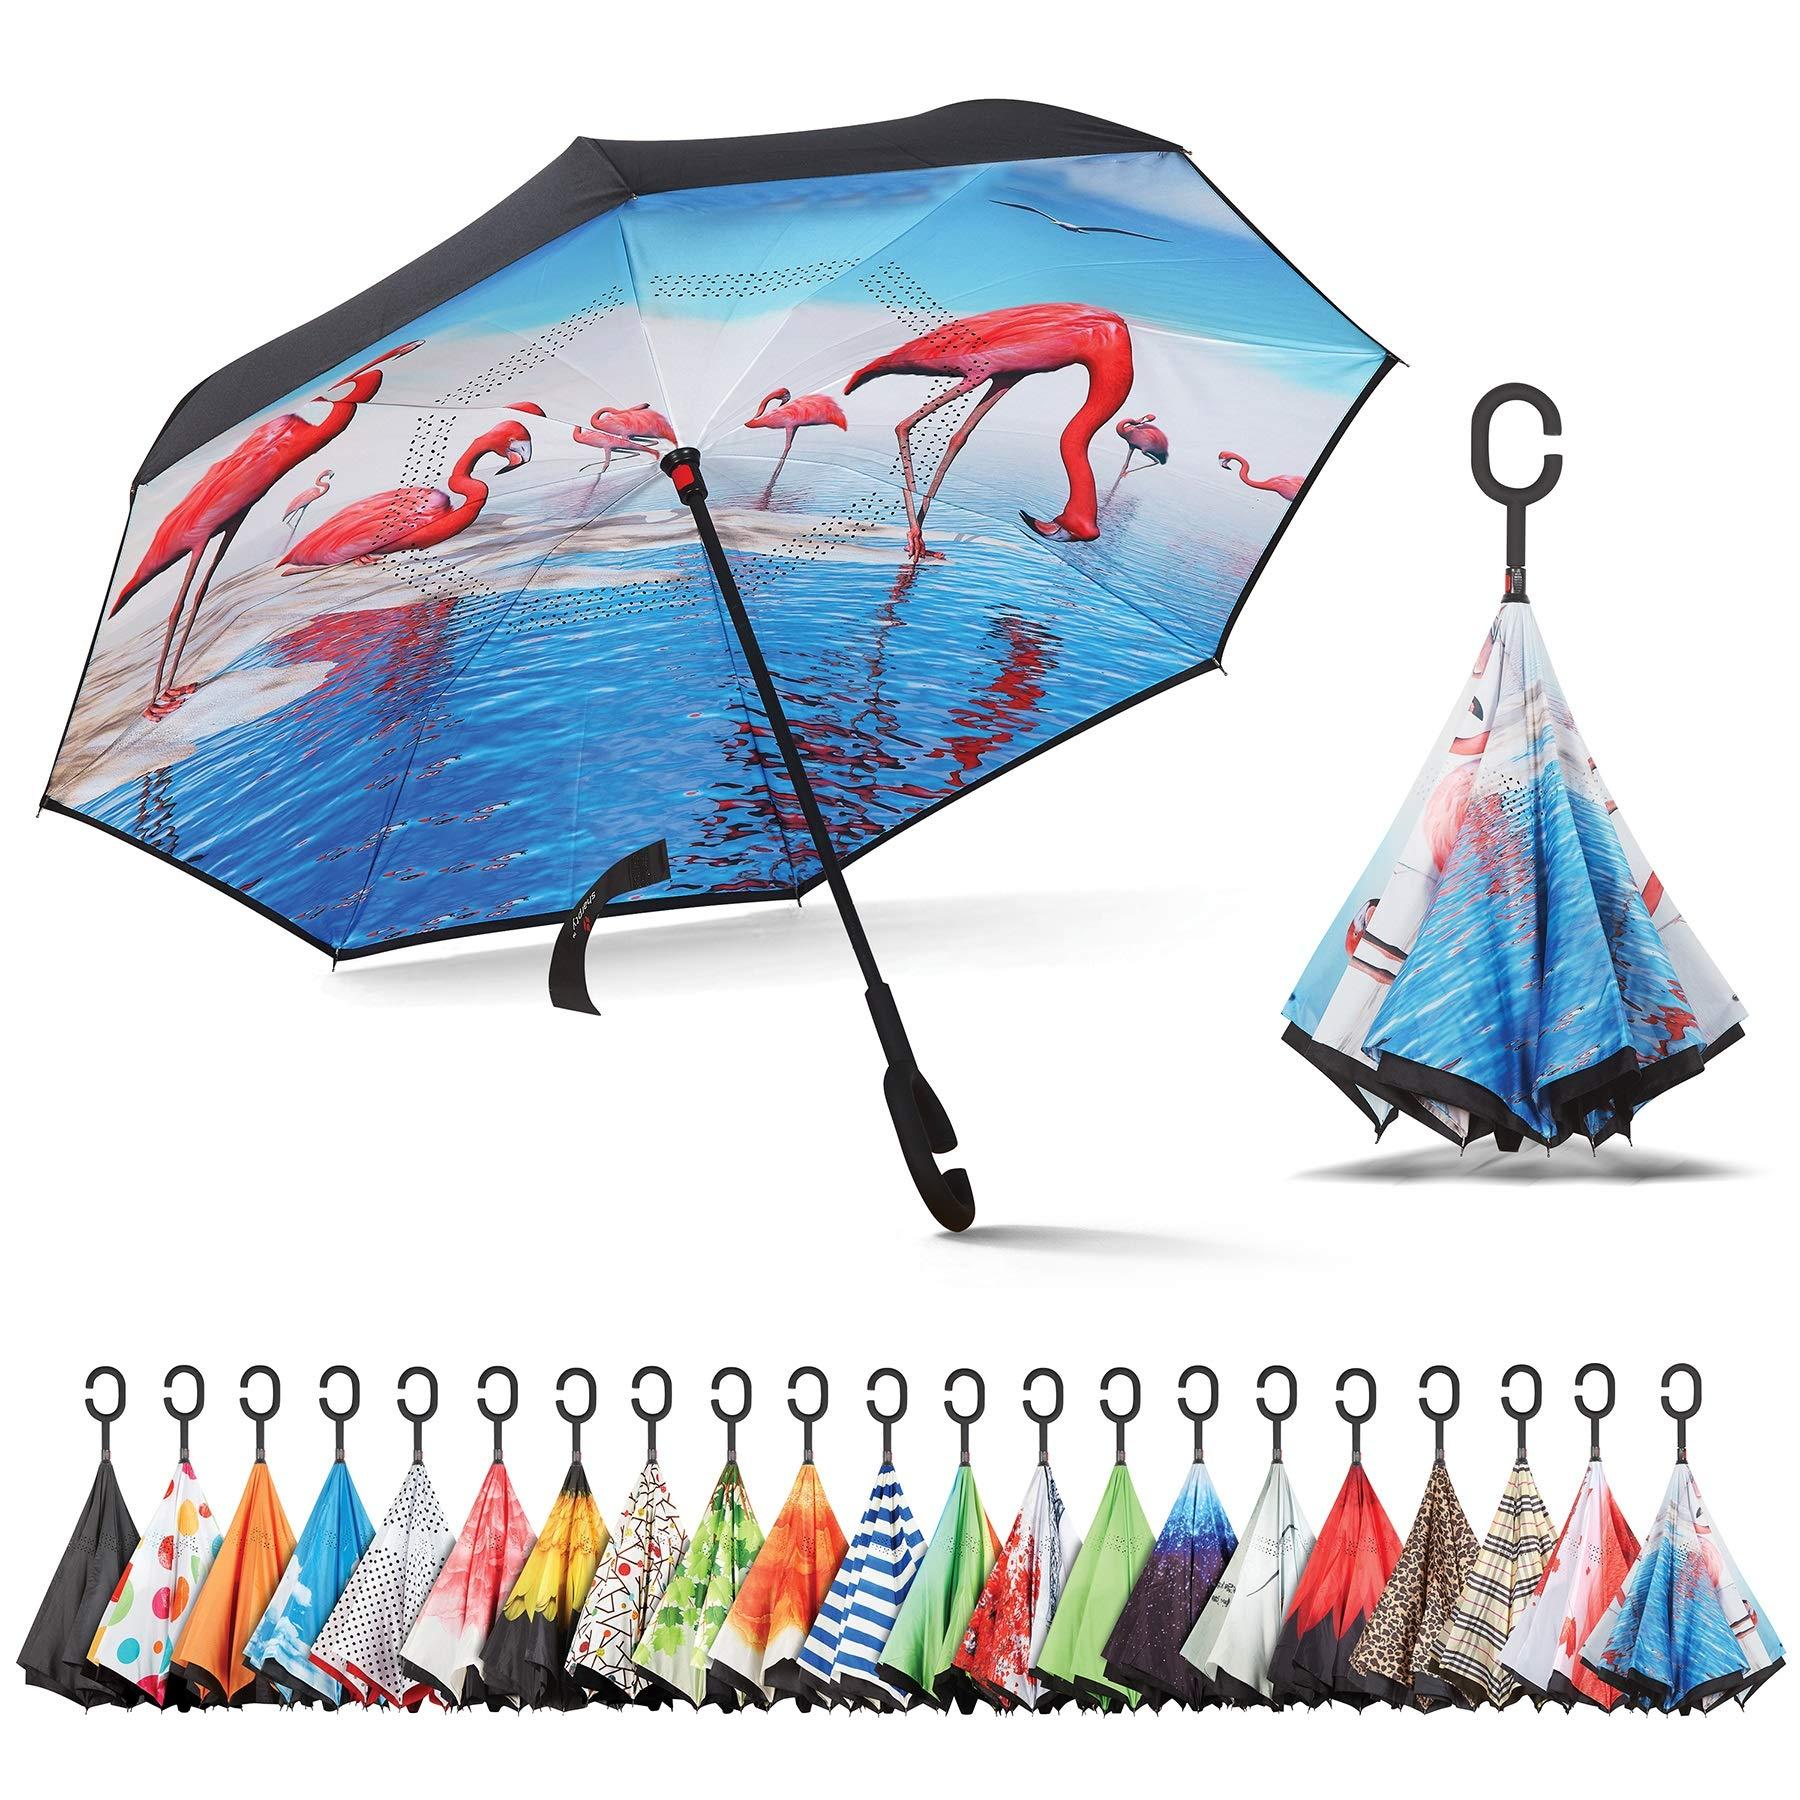 Sharpty Inverted Umbrella, Umbrella Windproof, Reverse Umbrella, Beautiful Umbrellas, Upside Down Umbrellas with C-Shaped Handle (Swan)